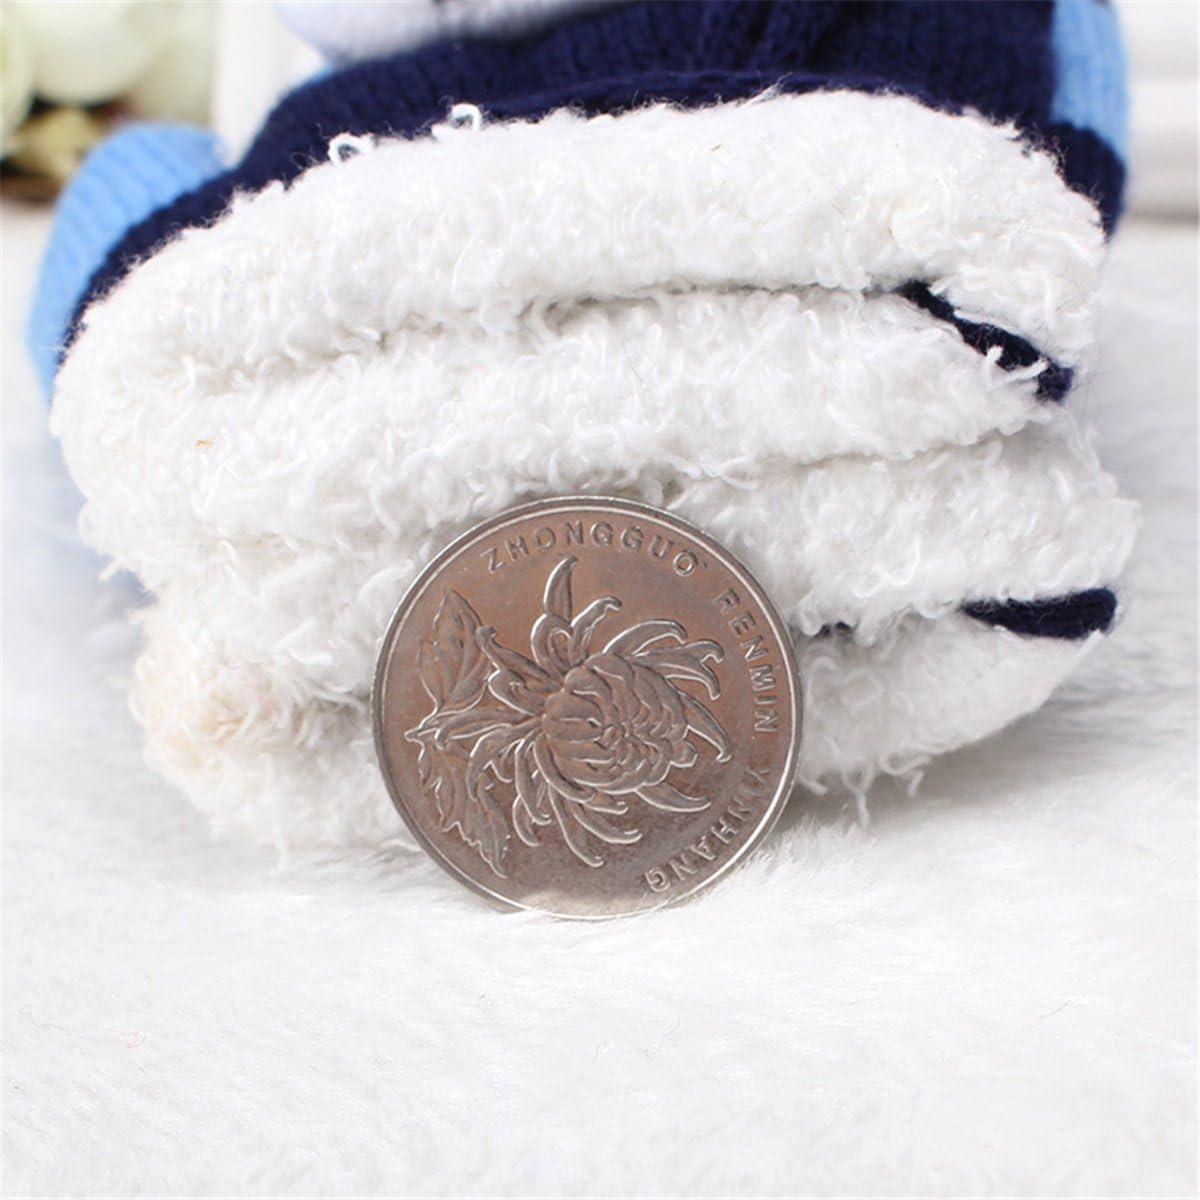 Cozylkx 1 Pair Kids Winter Warm Mittens, Double Layer Knit Football Pattern Full Fingers Gloves For Children